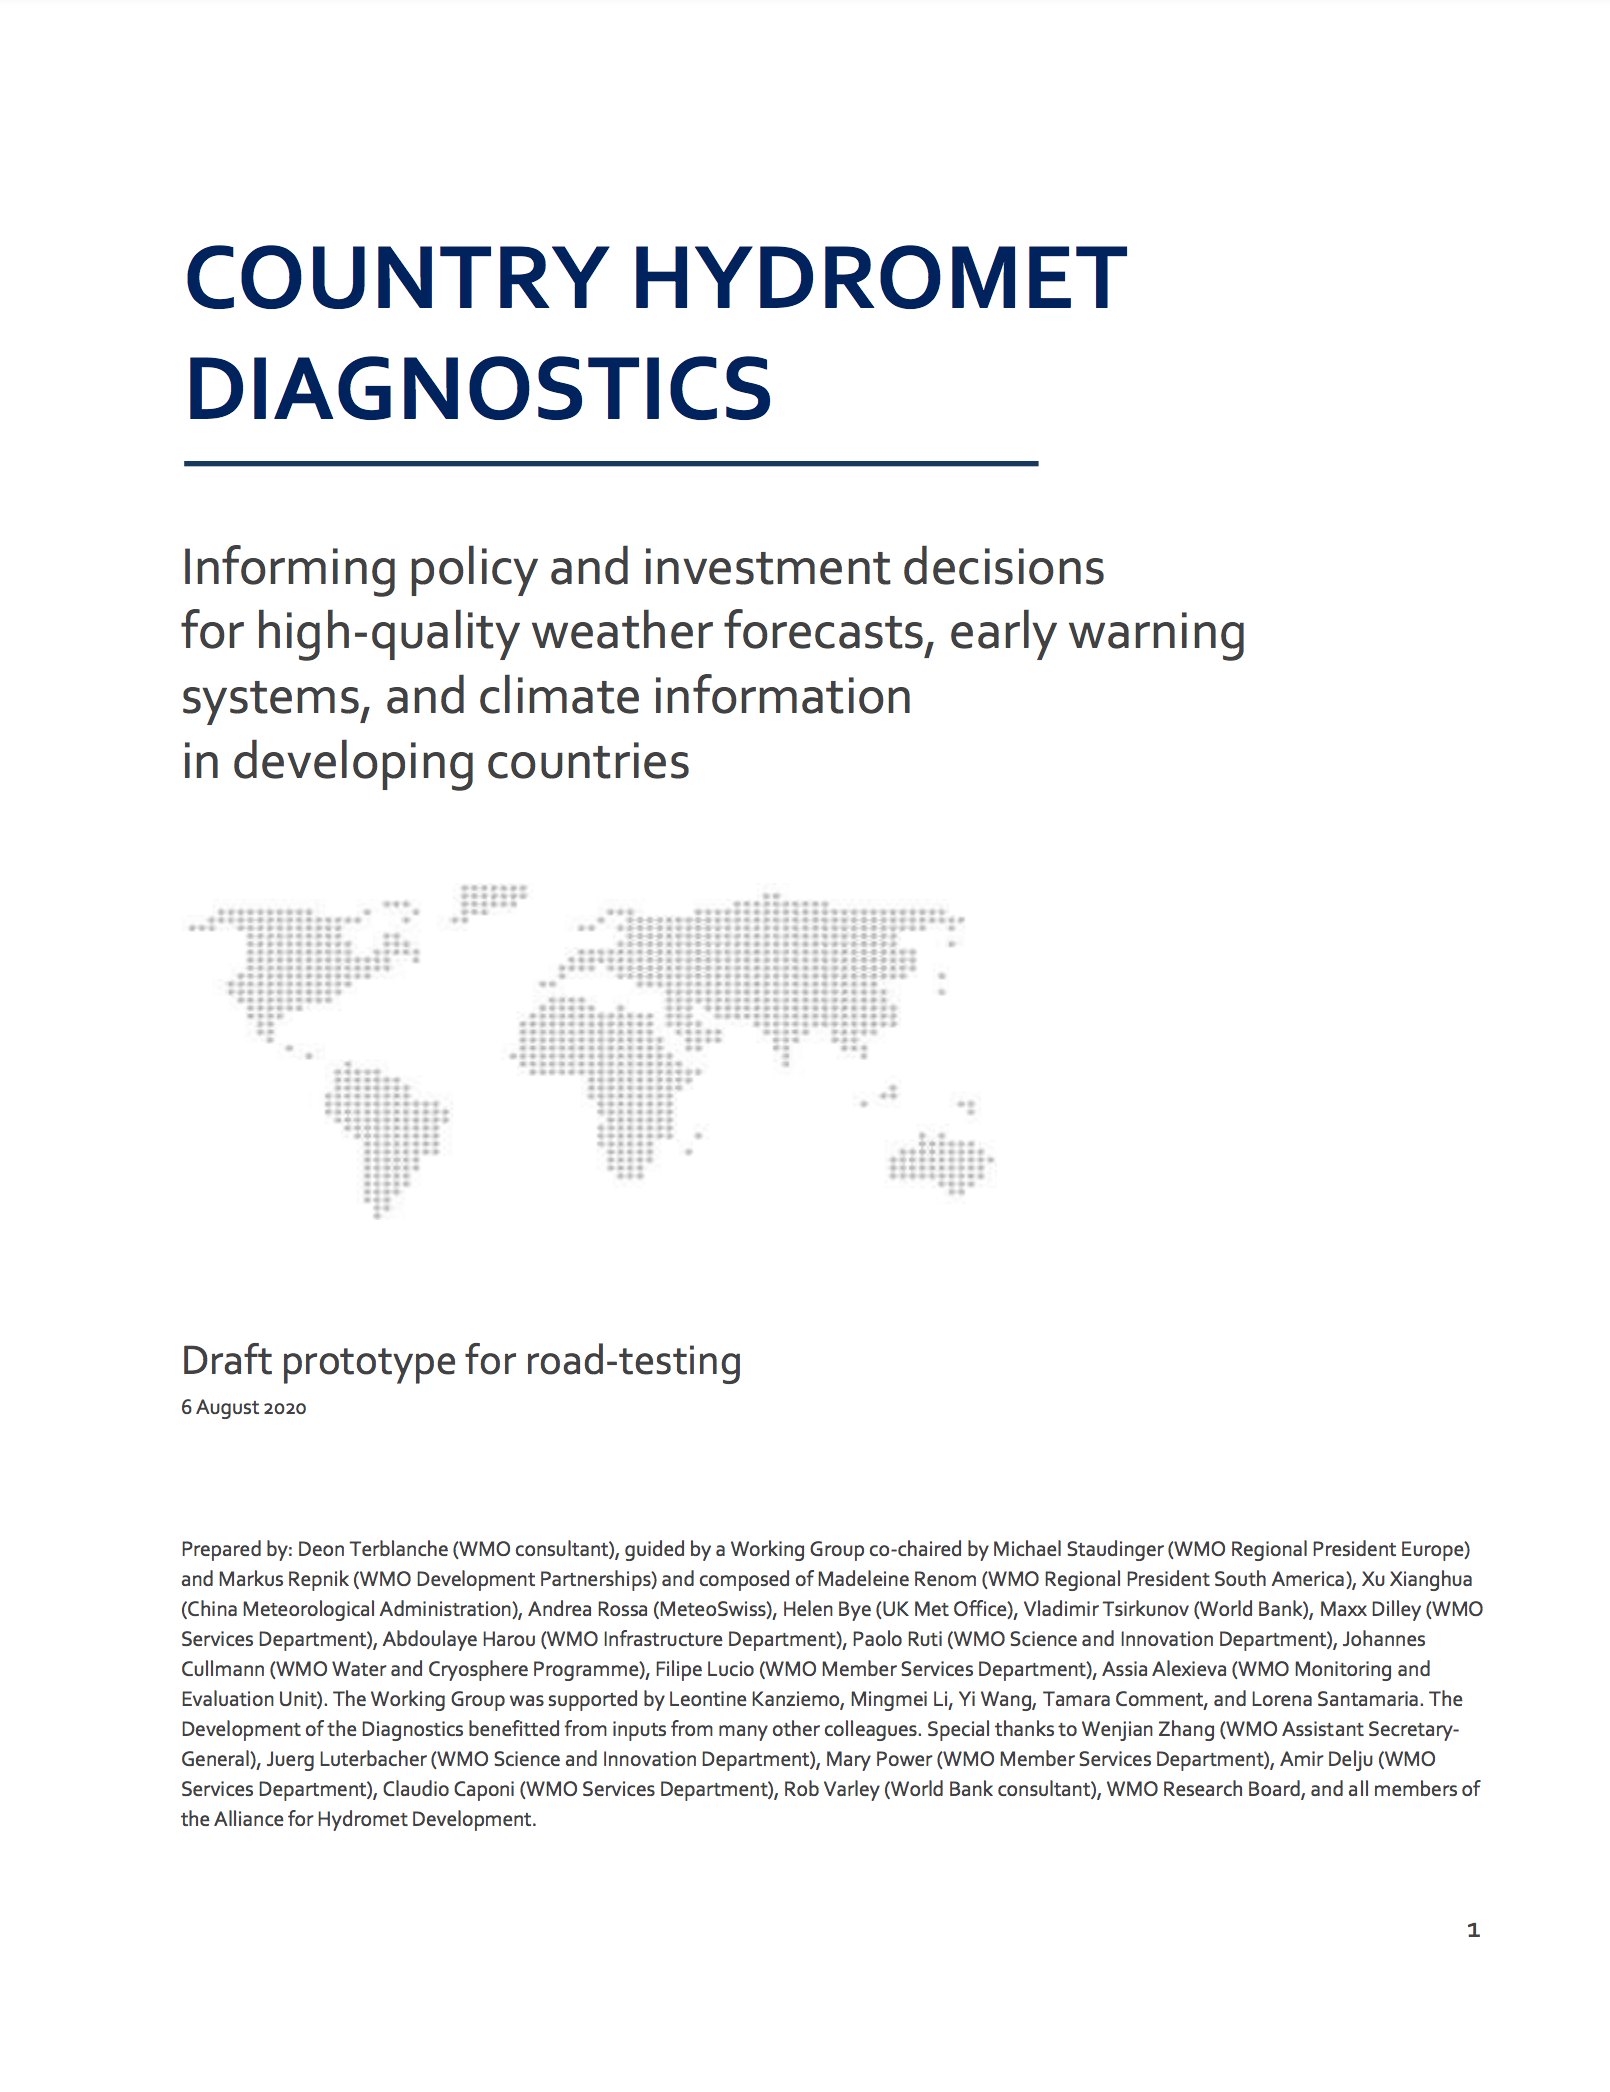 Country Hydromet Diagnostics